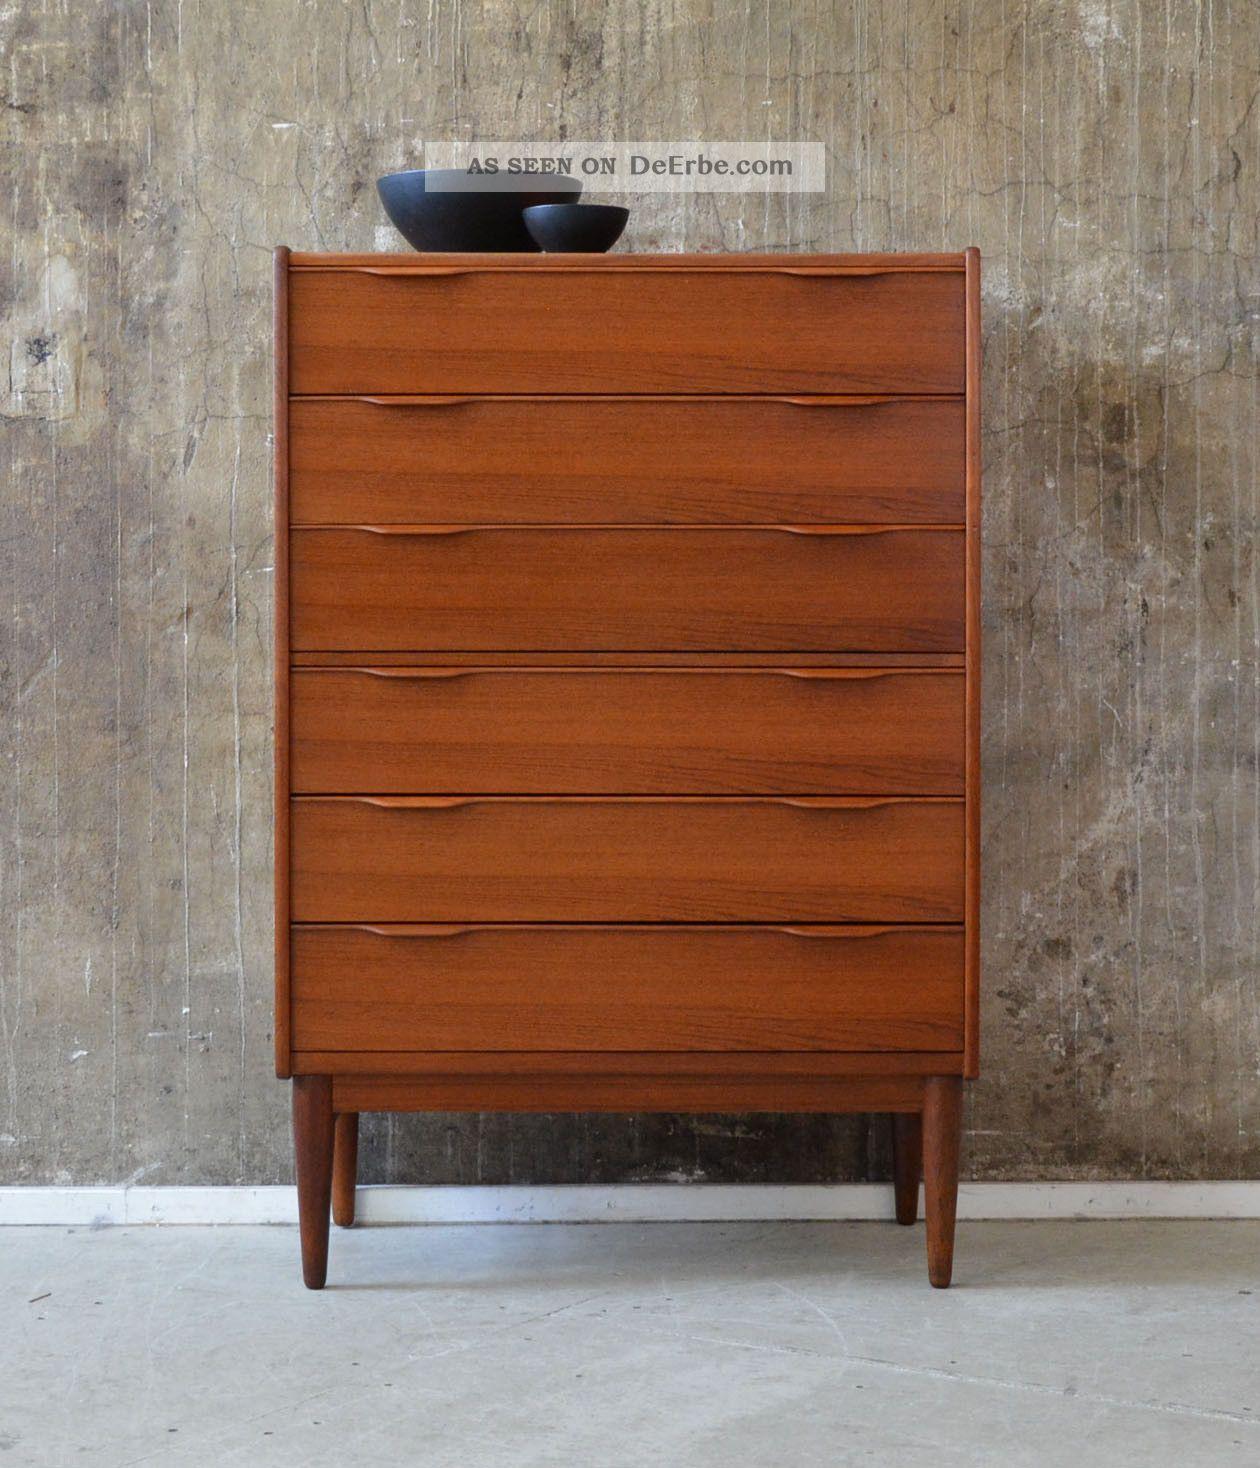 60er teak kommode highboard danish design 60s cabinet chest kai kristiansen ra. Black Bedroom Furniture Sets. Home Design Ideas